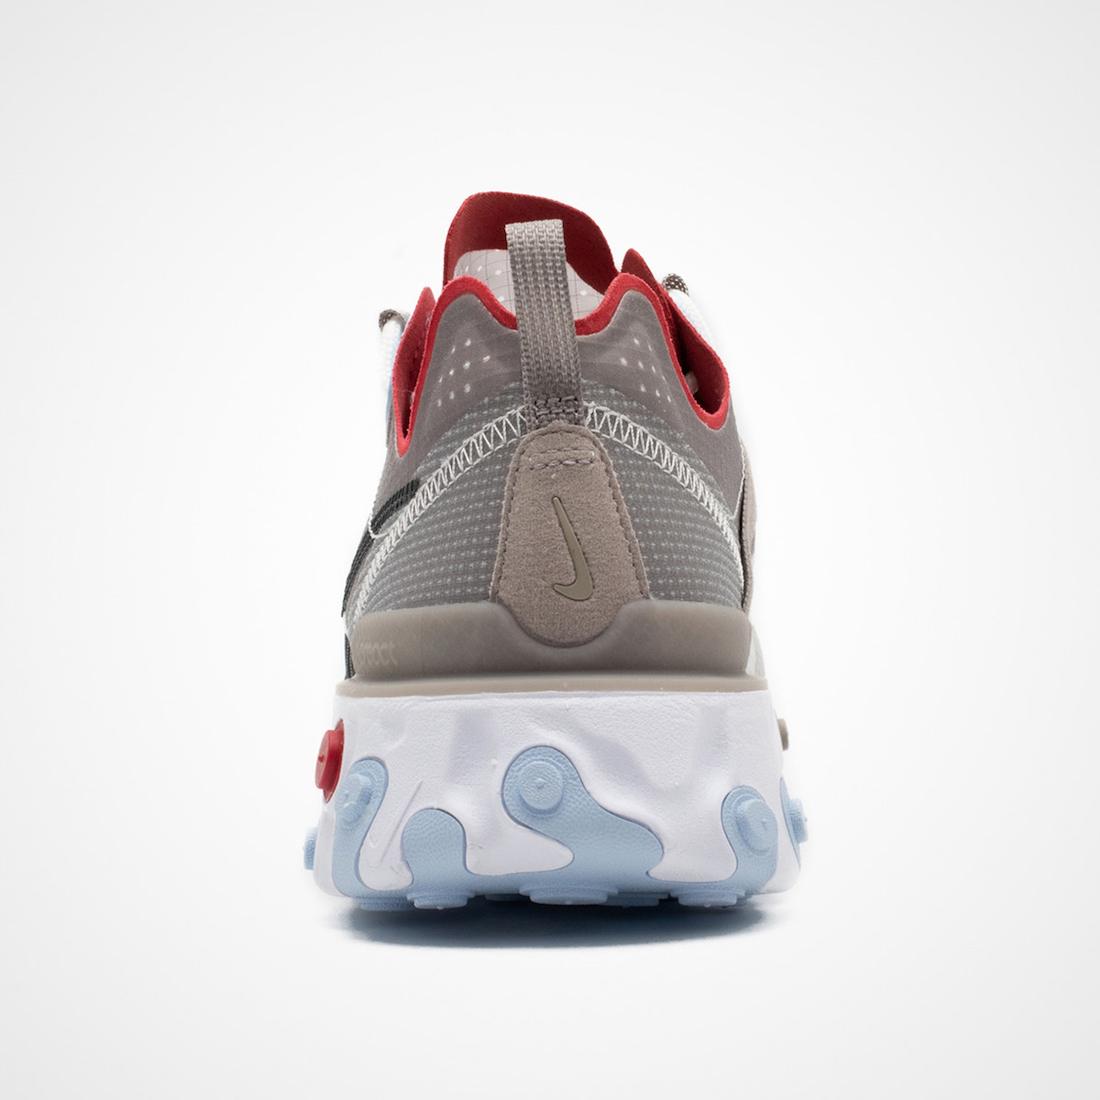 Nike React Element 55 Beige Brown Red Blue CU1466-001 Release Date Info